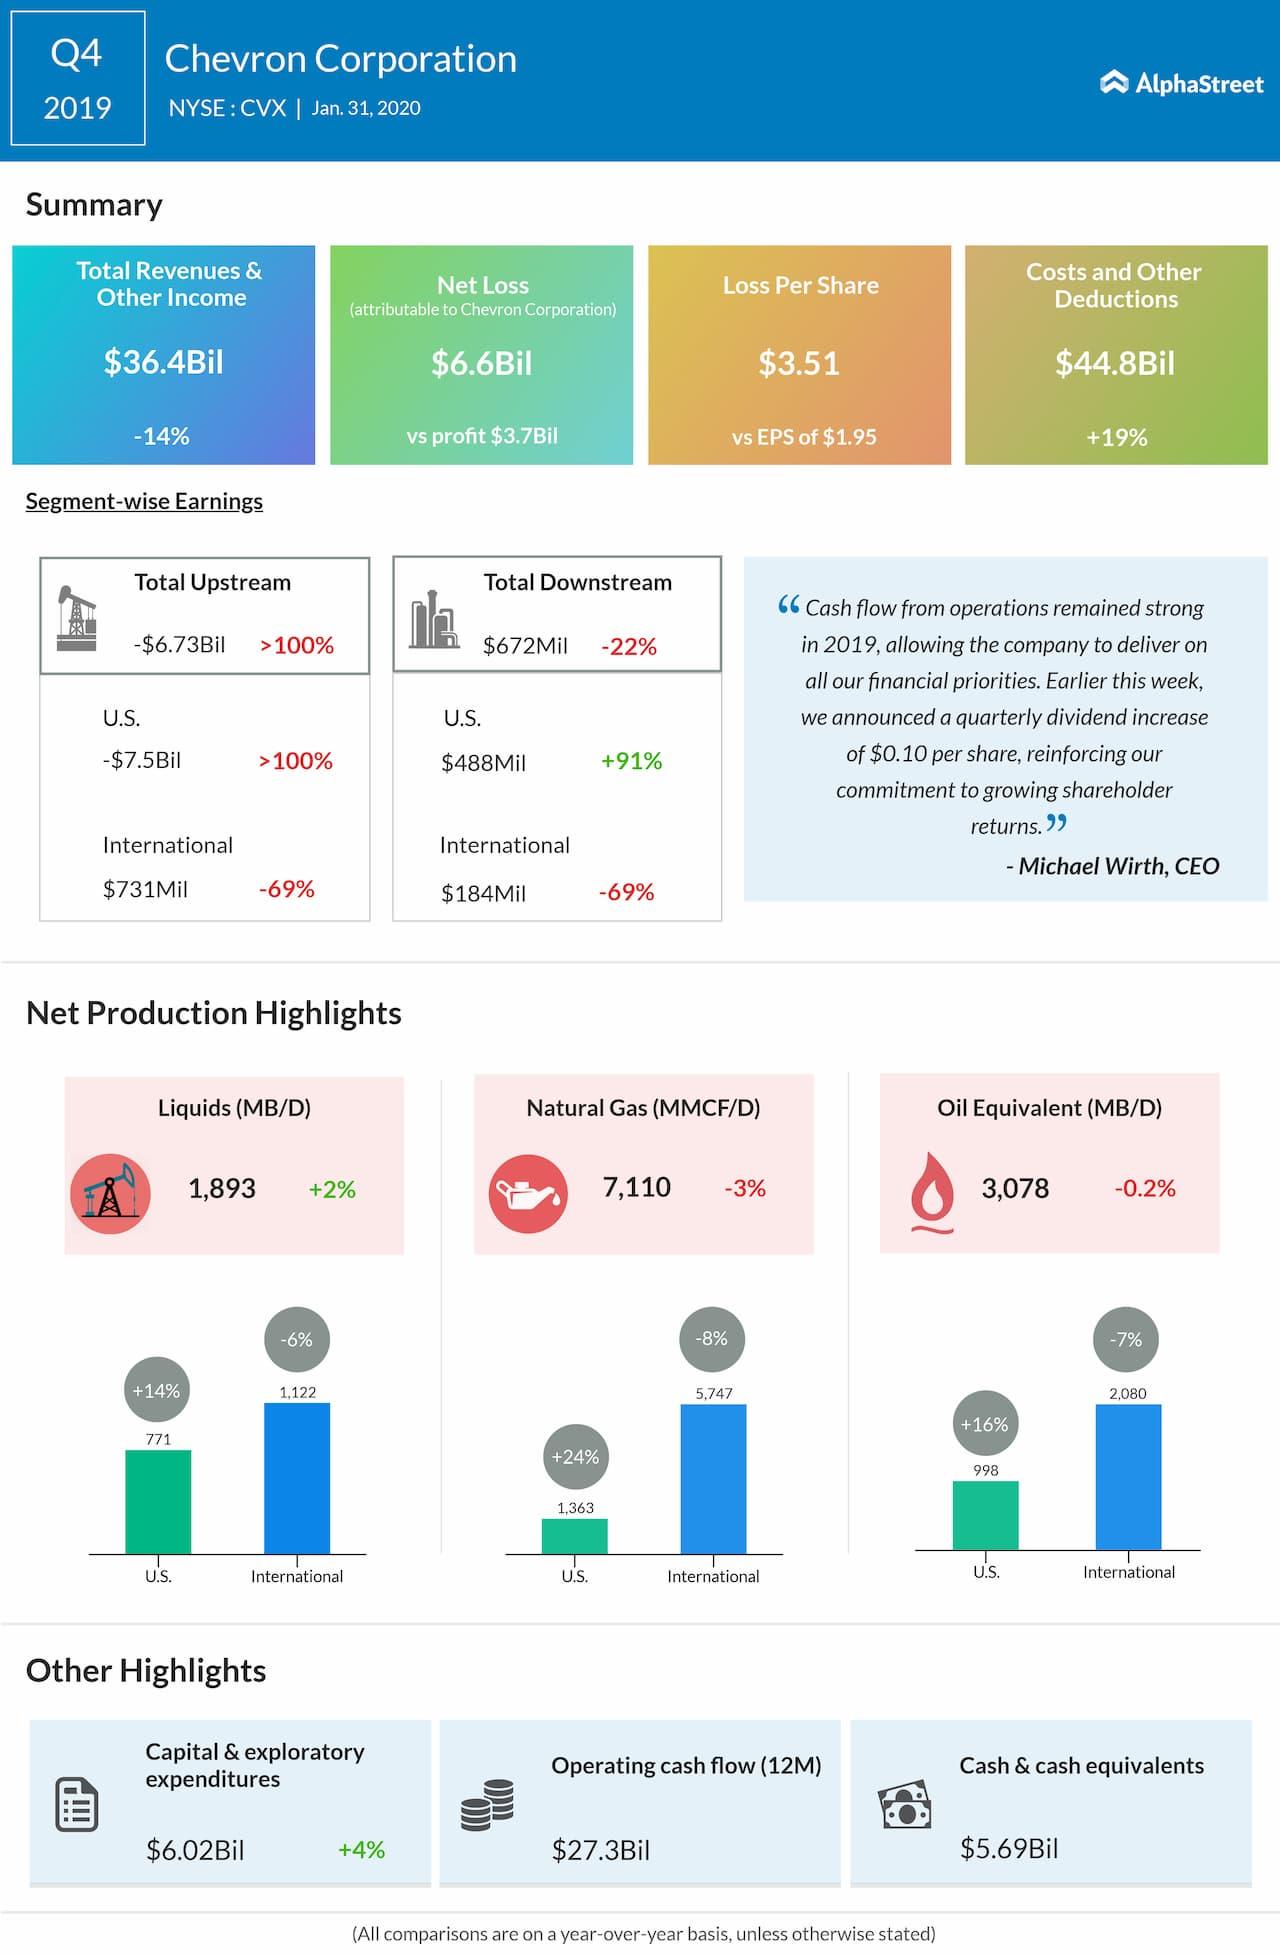 Chevron (CVX) Q4 2019 earnings results